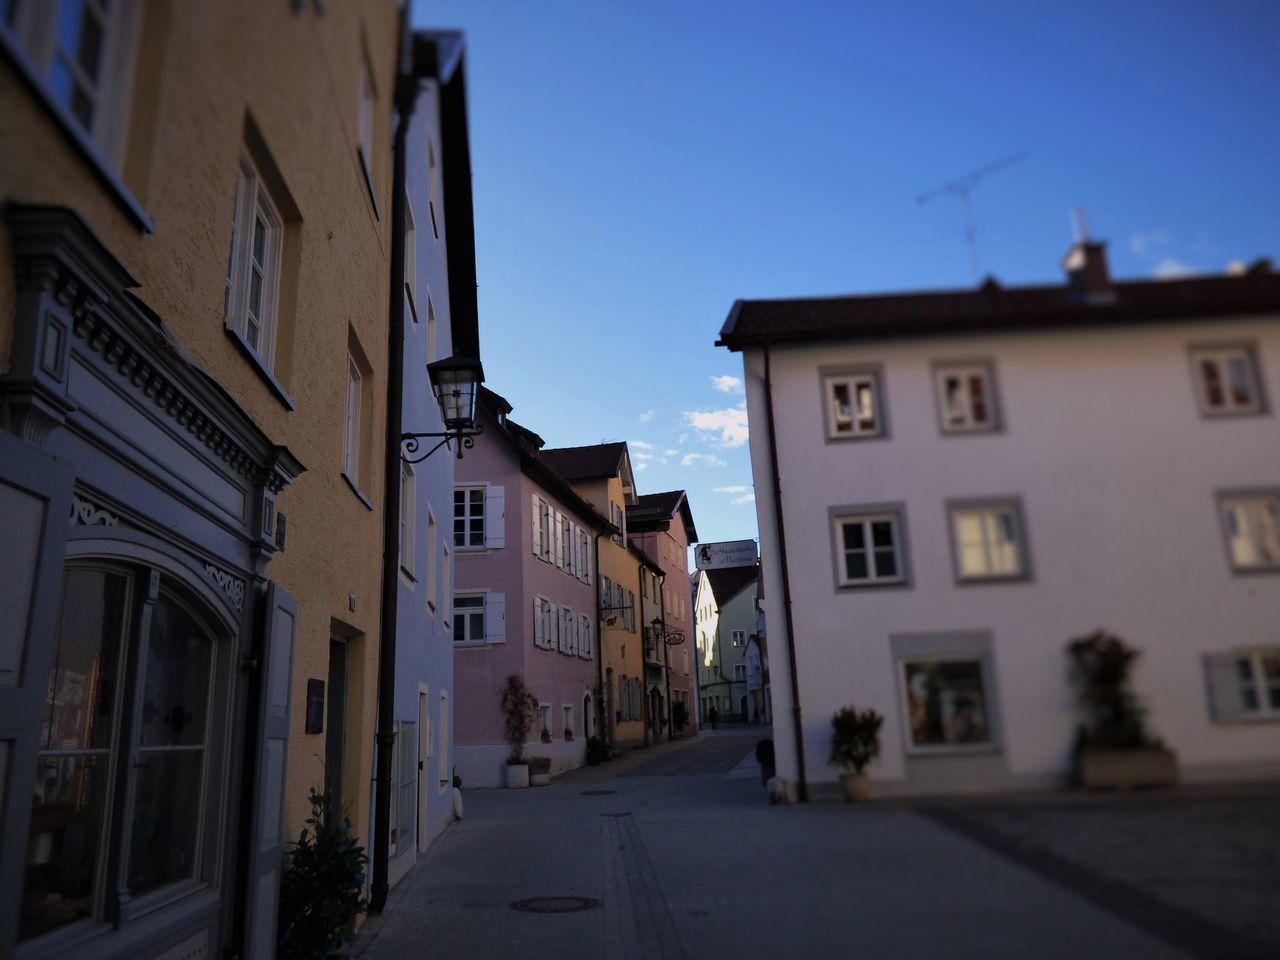 Architecture Built Structure City Façade Füssen, Bayern, Deutschland Holidays House Oldtown Pastel Colors Pastel Power Street Travelling